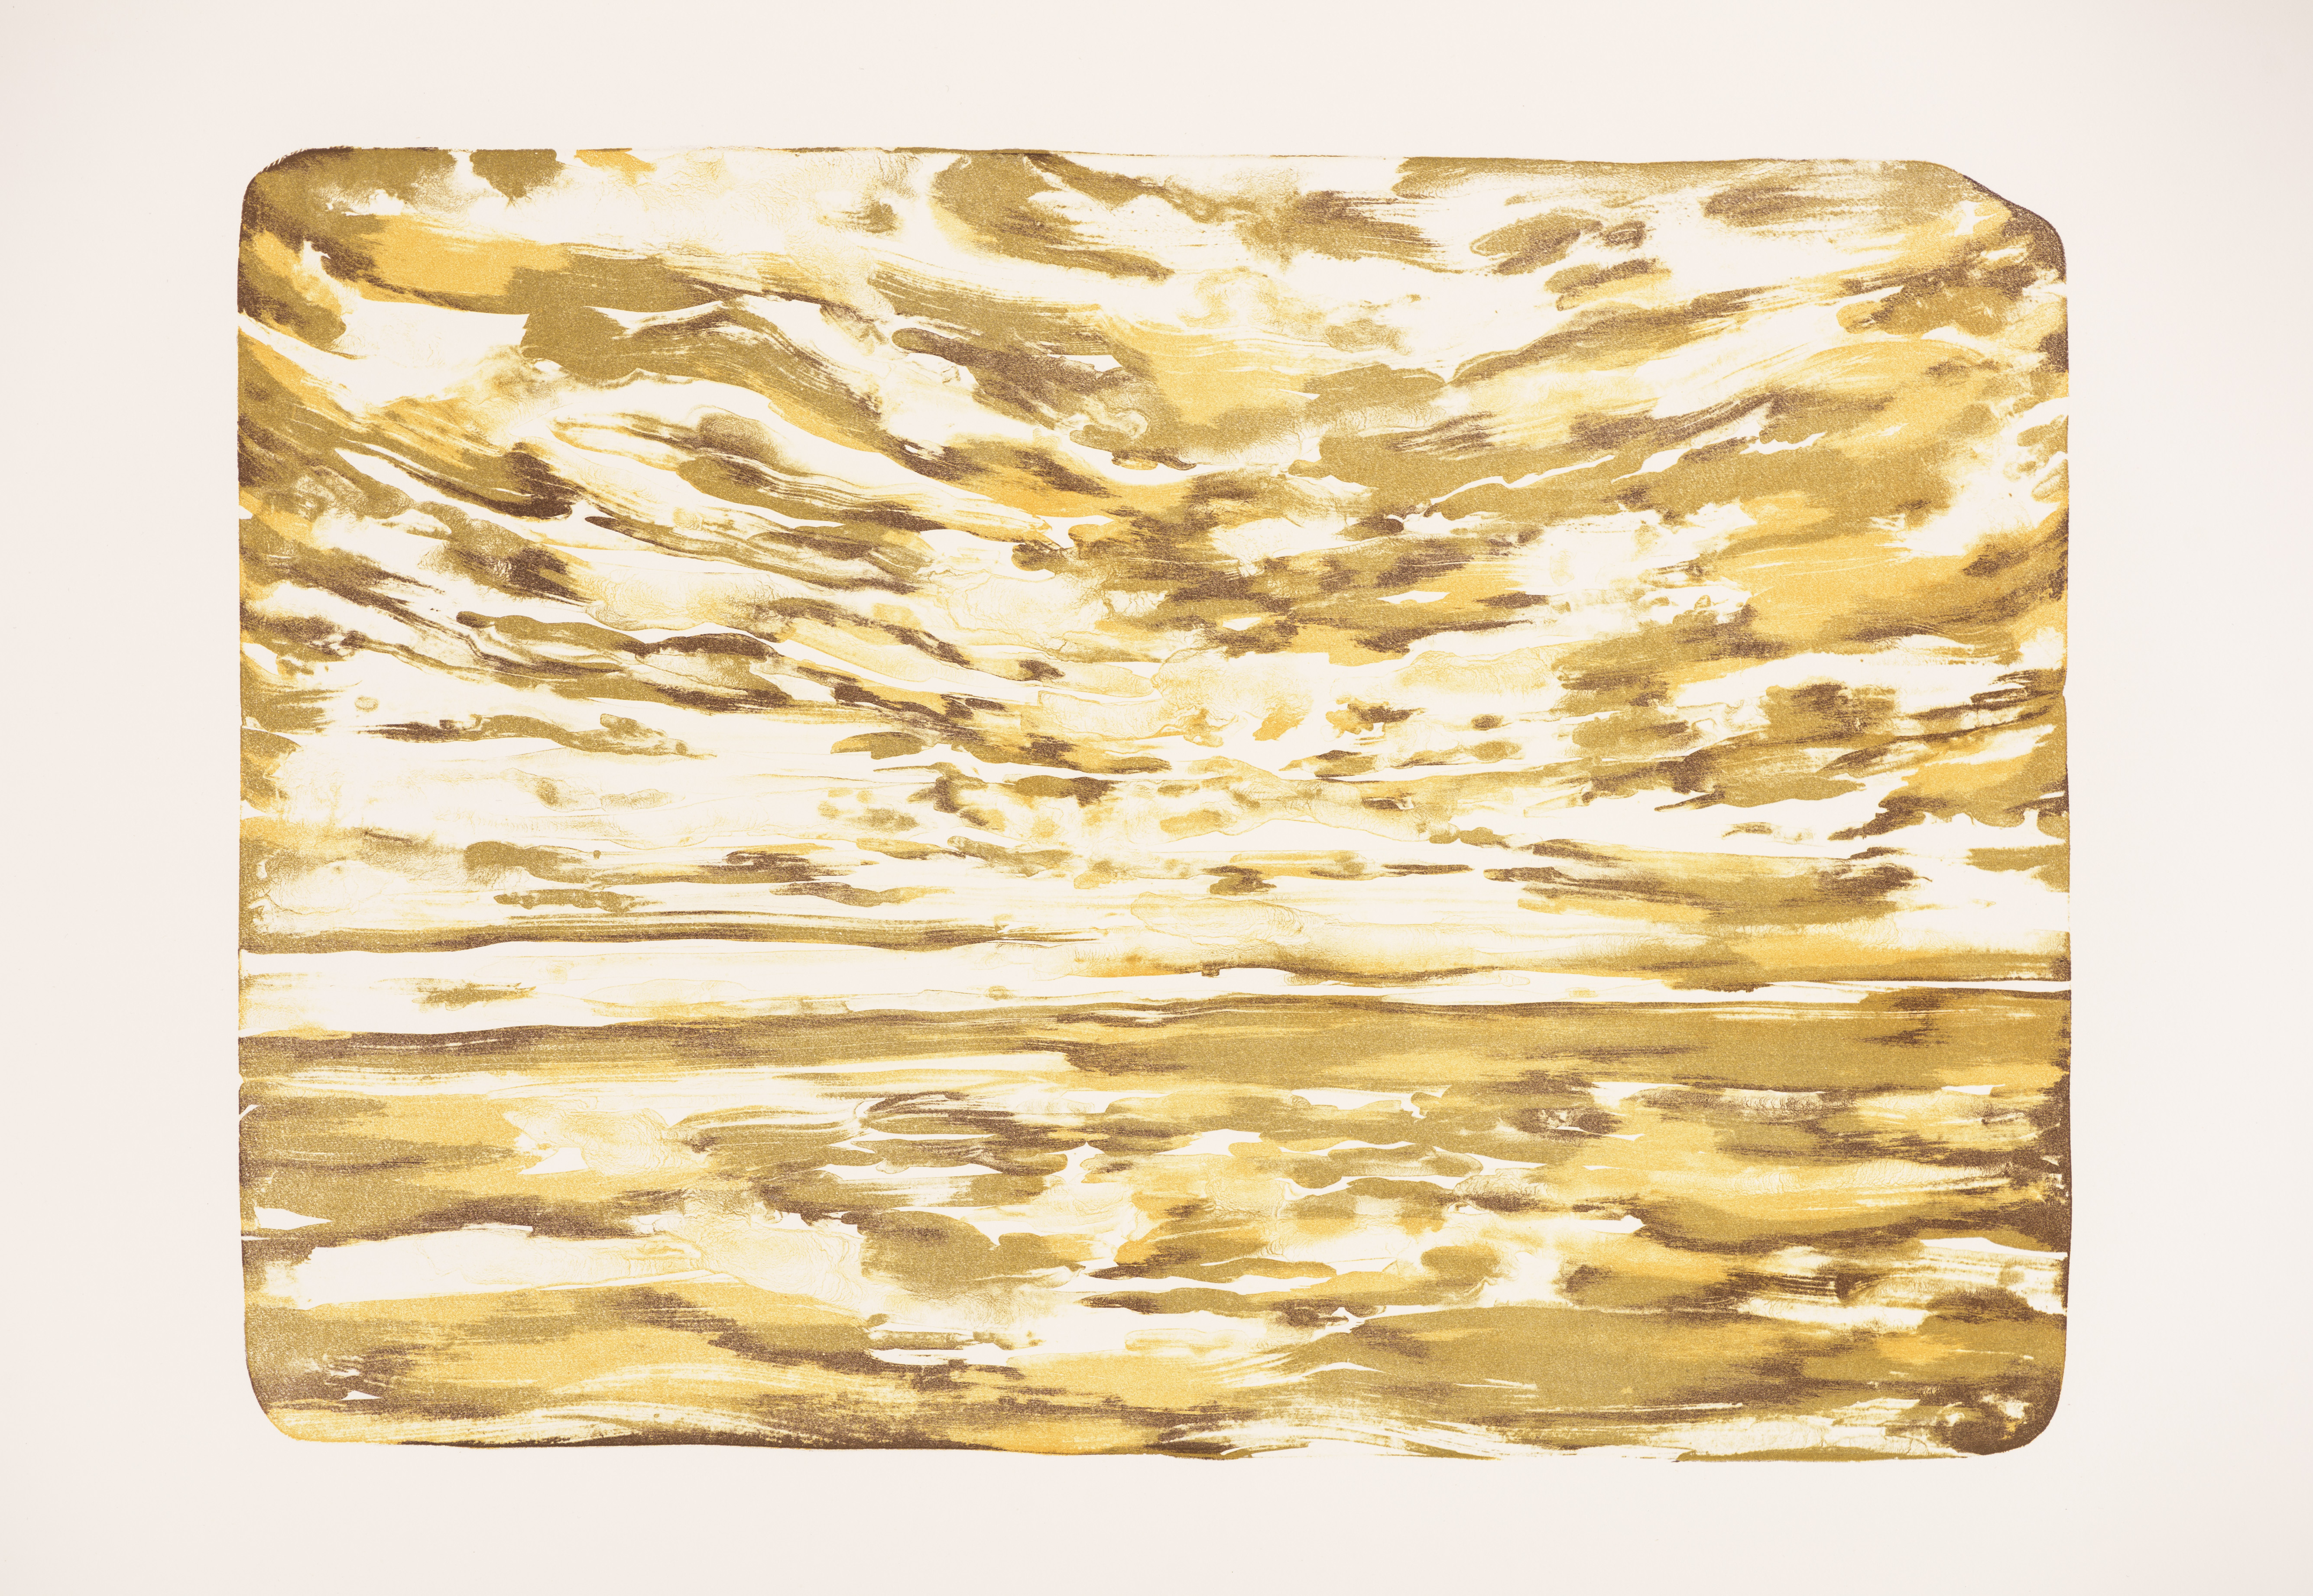 """Goldenen Sonnenuntergang"" 59 x 41,5 cm. lithography, 3 colours (2016)"